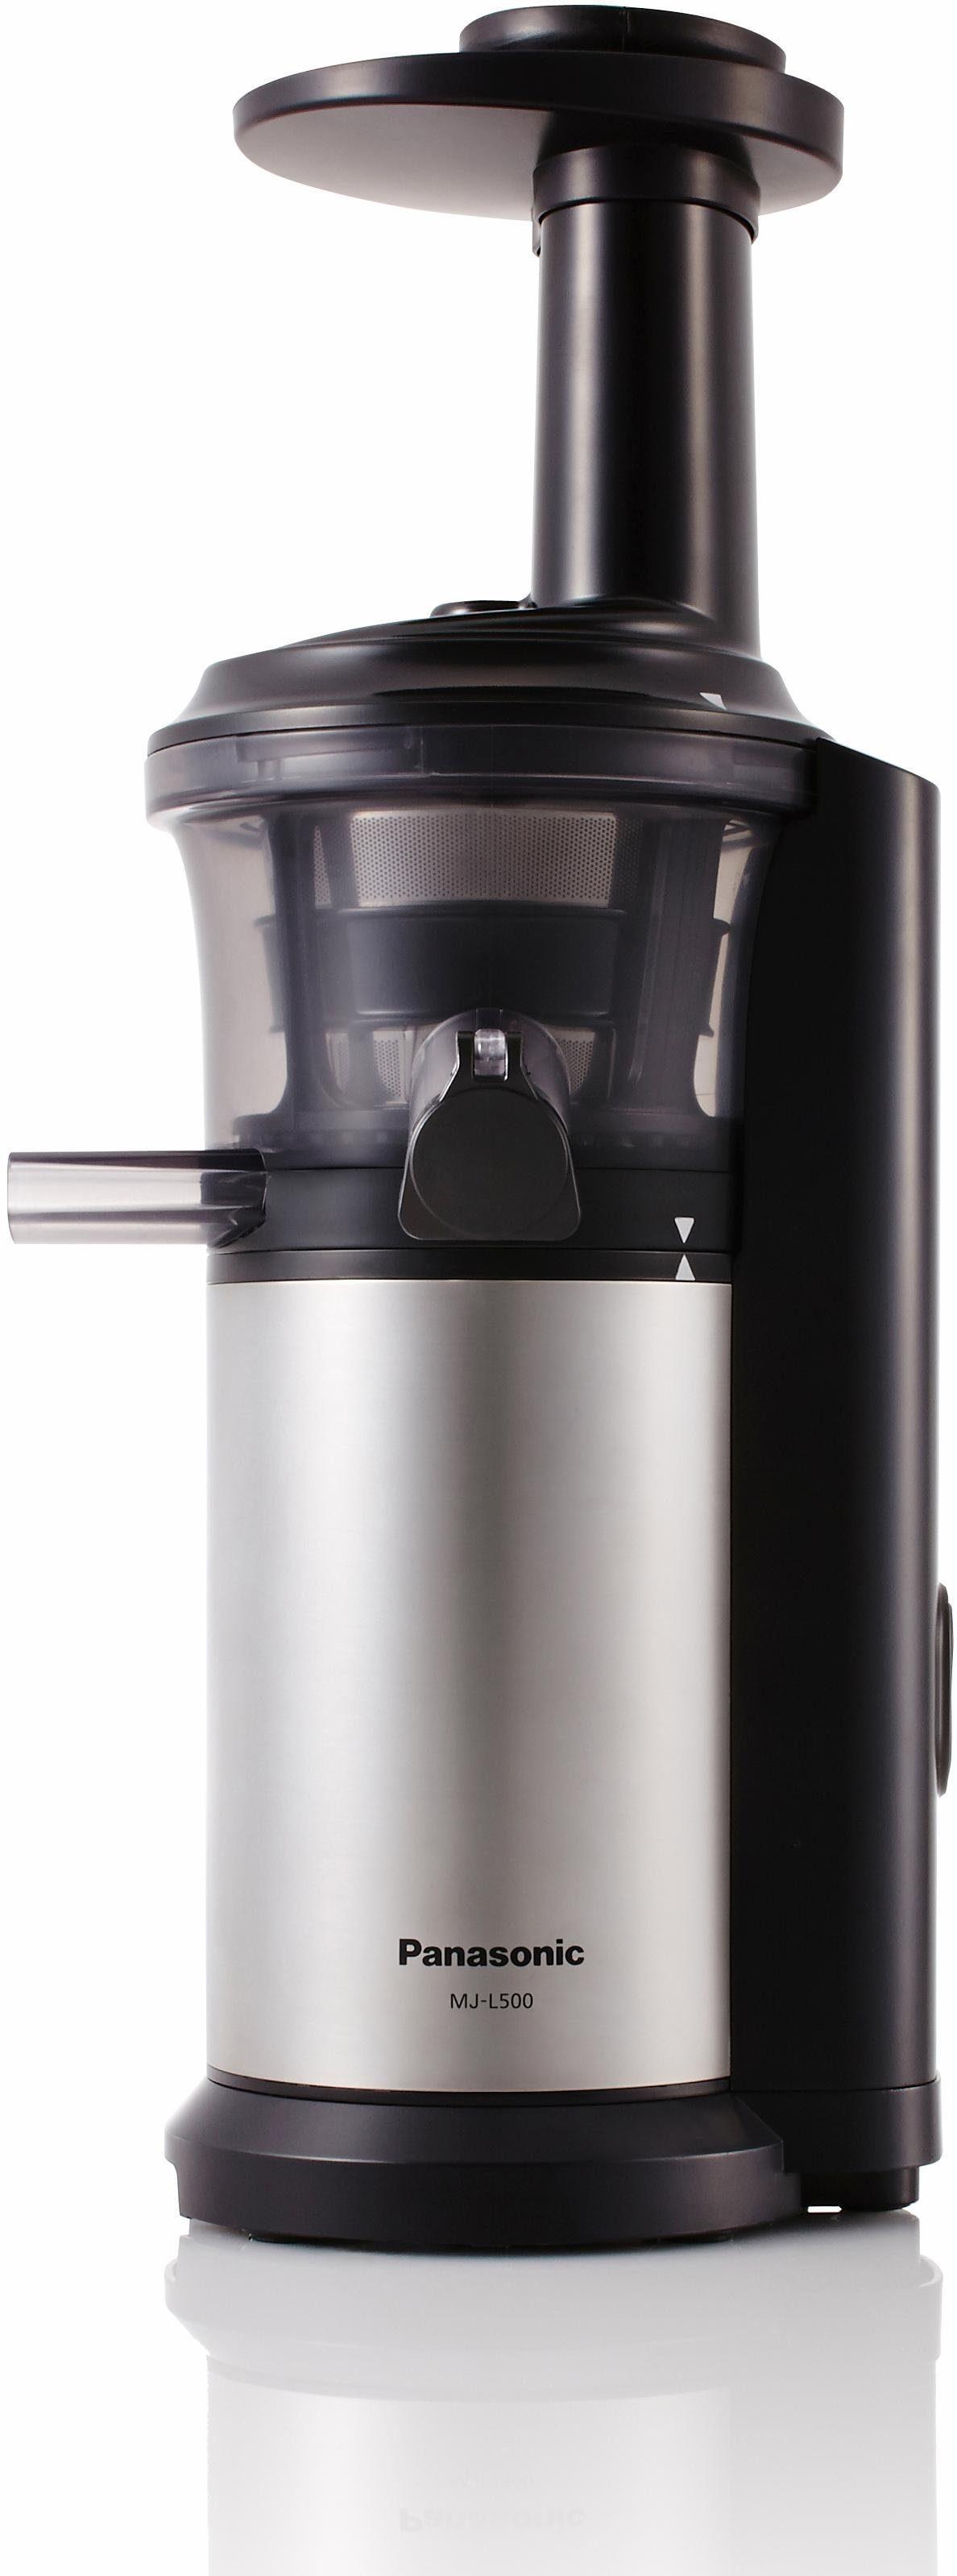 Panasonic Slow Juicer MJ-L500SXE, 150 Watt